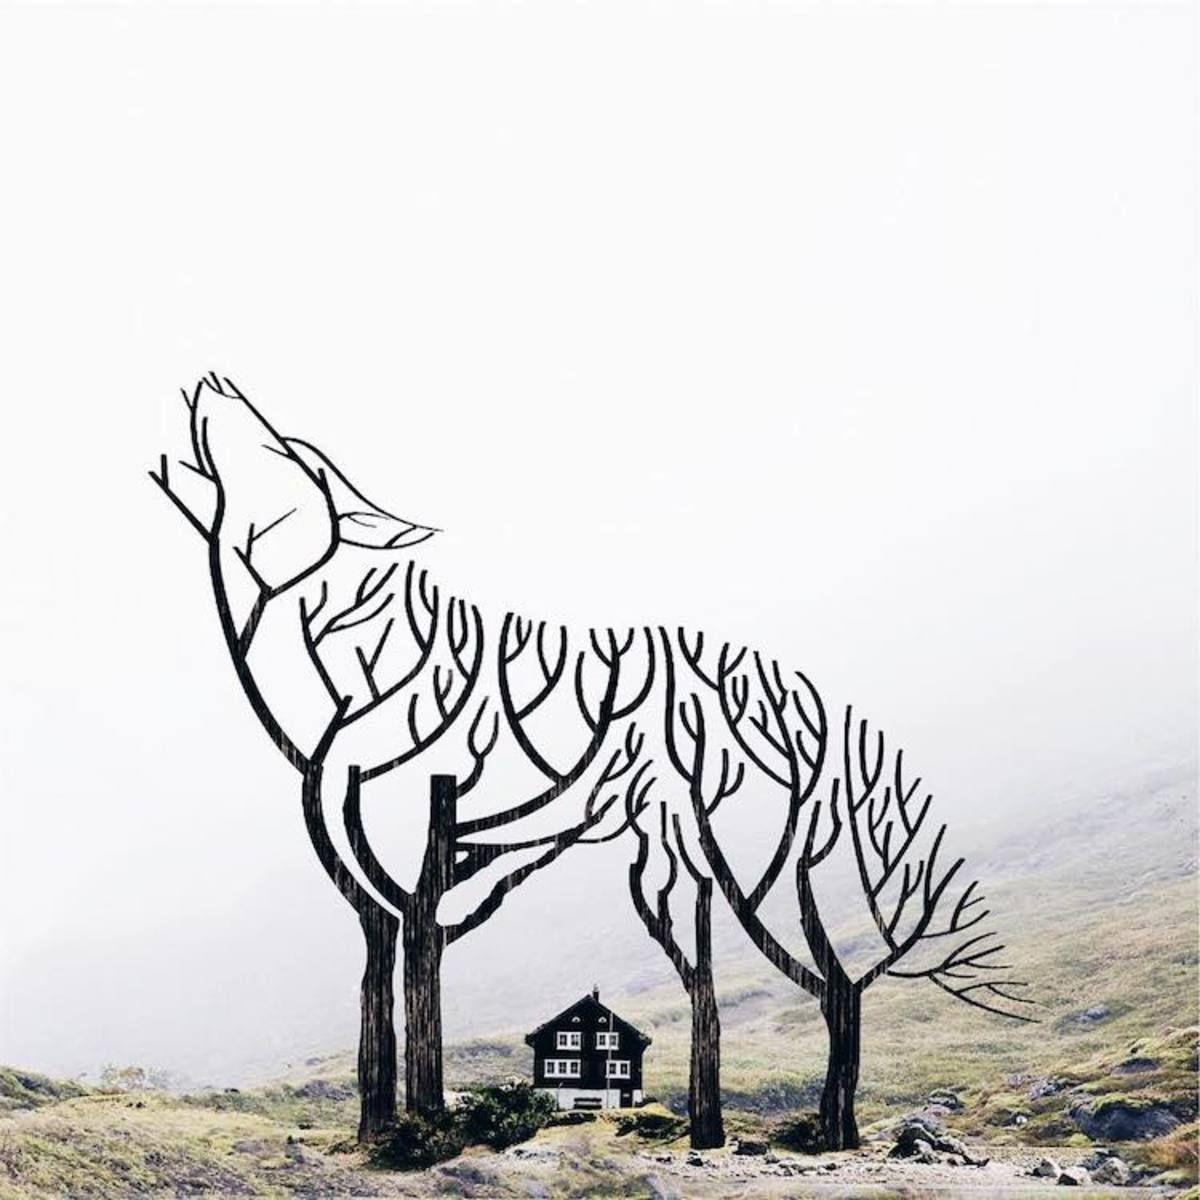 Photographer Uses Photoshop To Create Surreal Dreamy Composite - Photographer uses photoshop to create surreal dreamy composite images